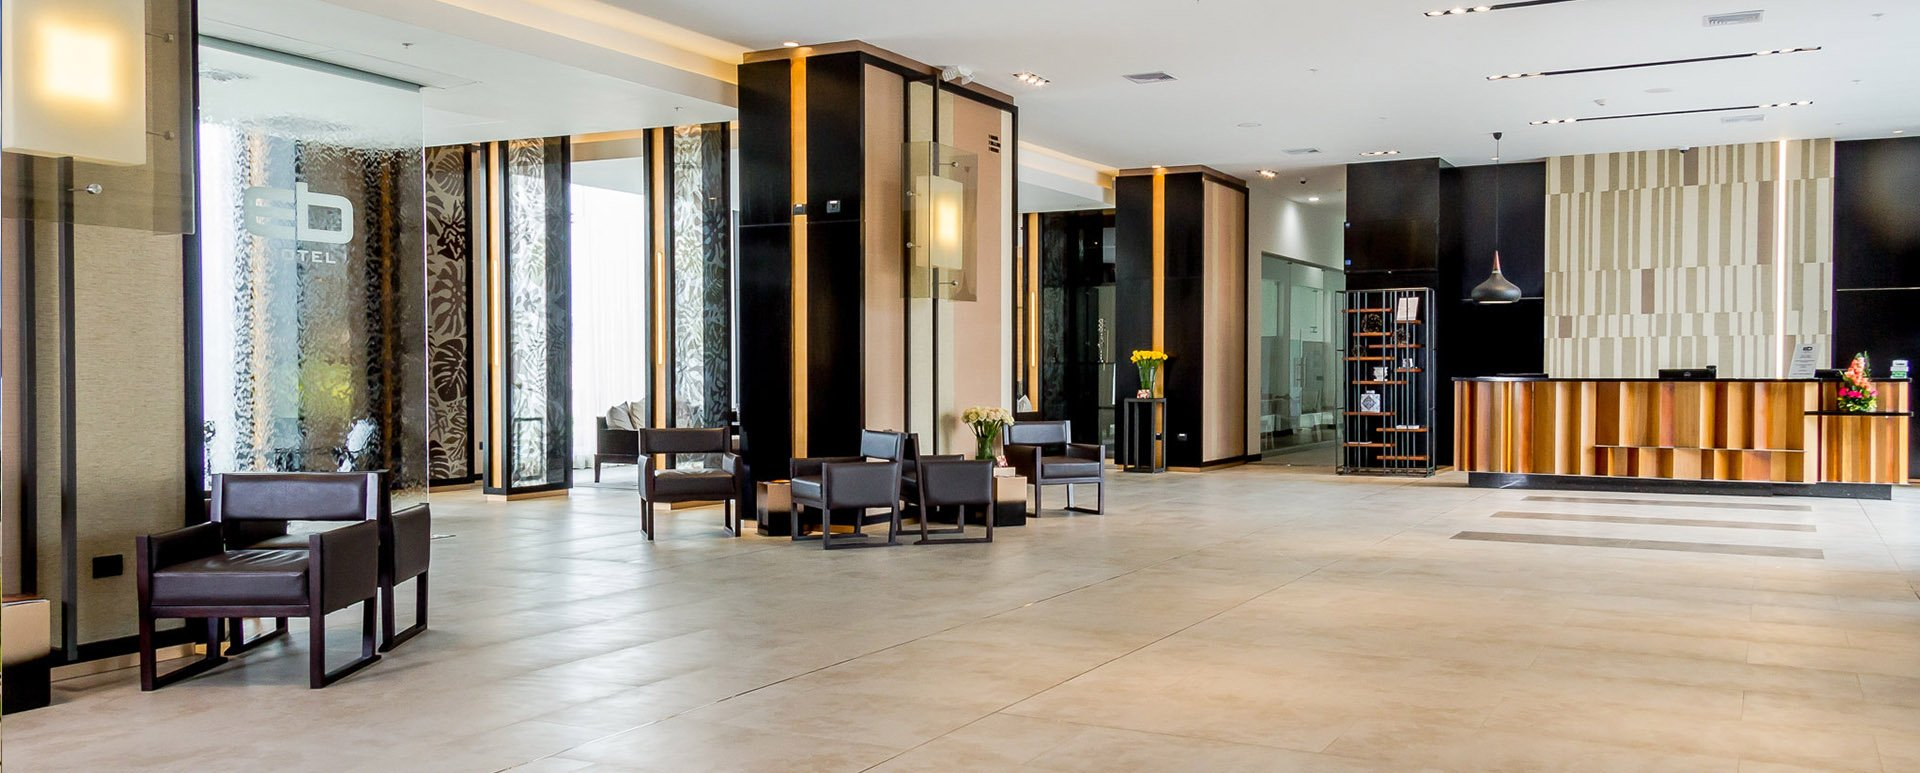 EB Airport Hotel lobby